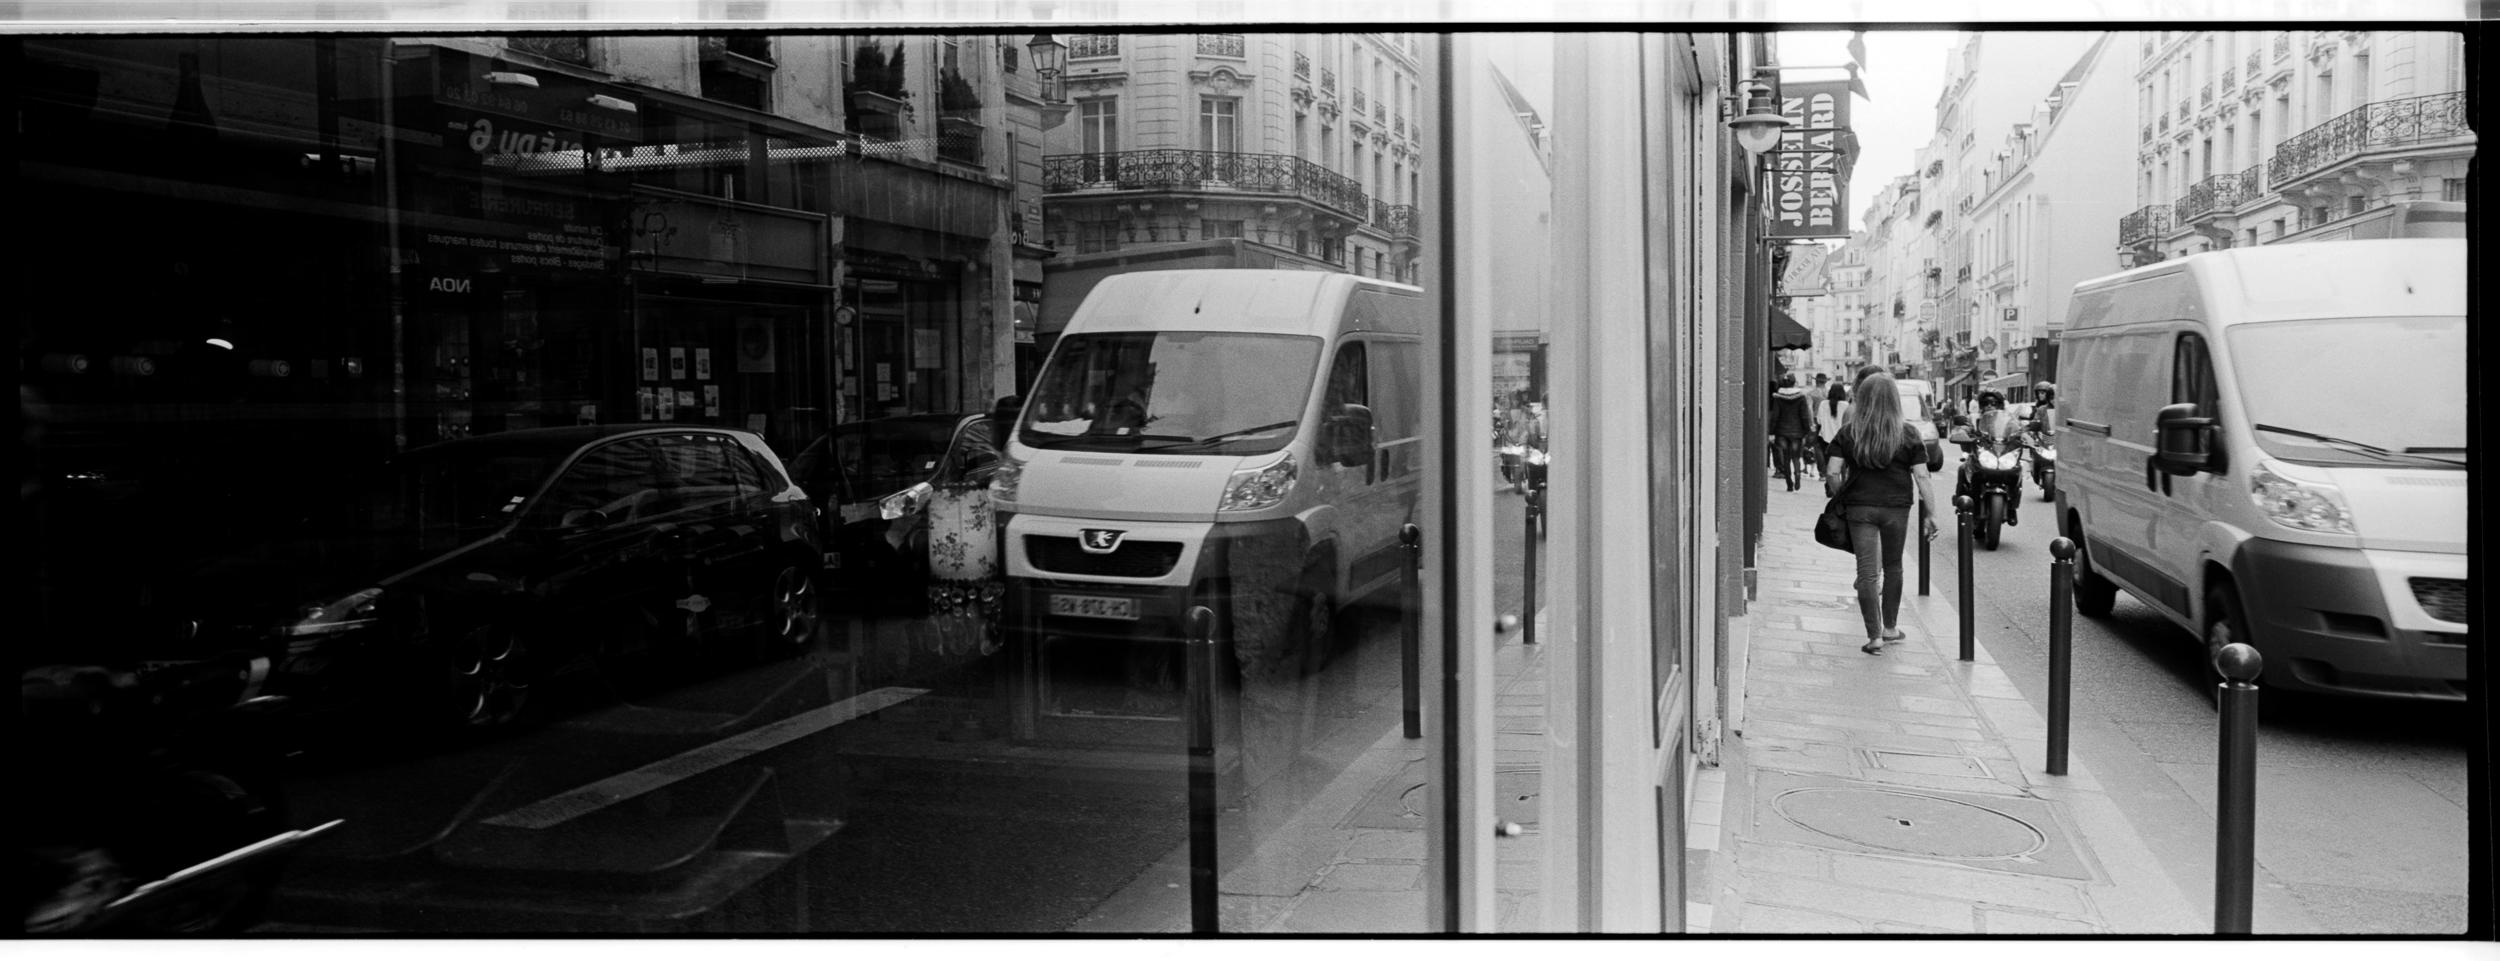 66-FranceXpanBW107.jpg